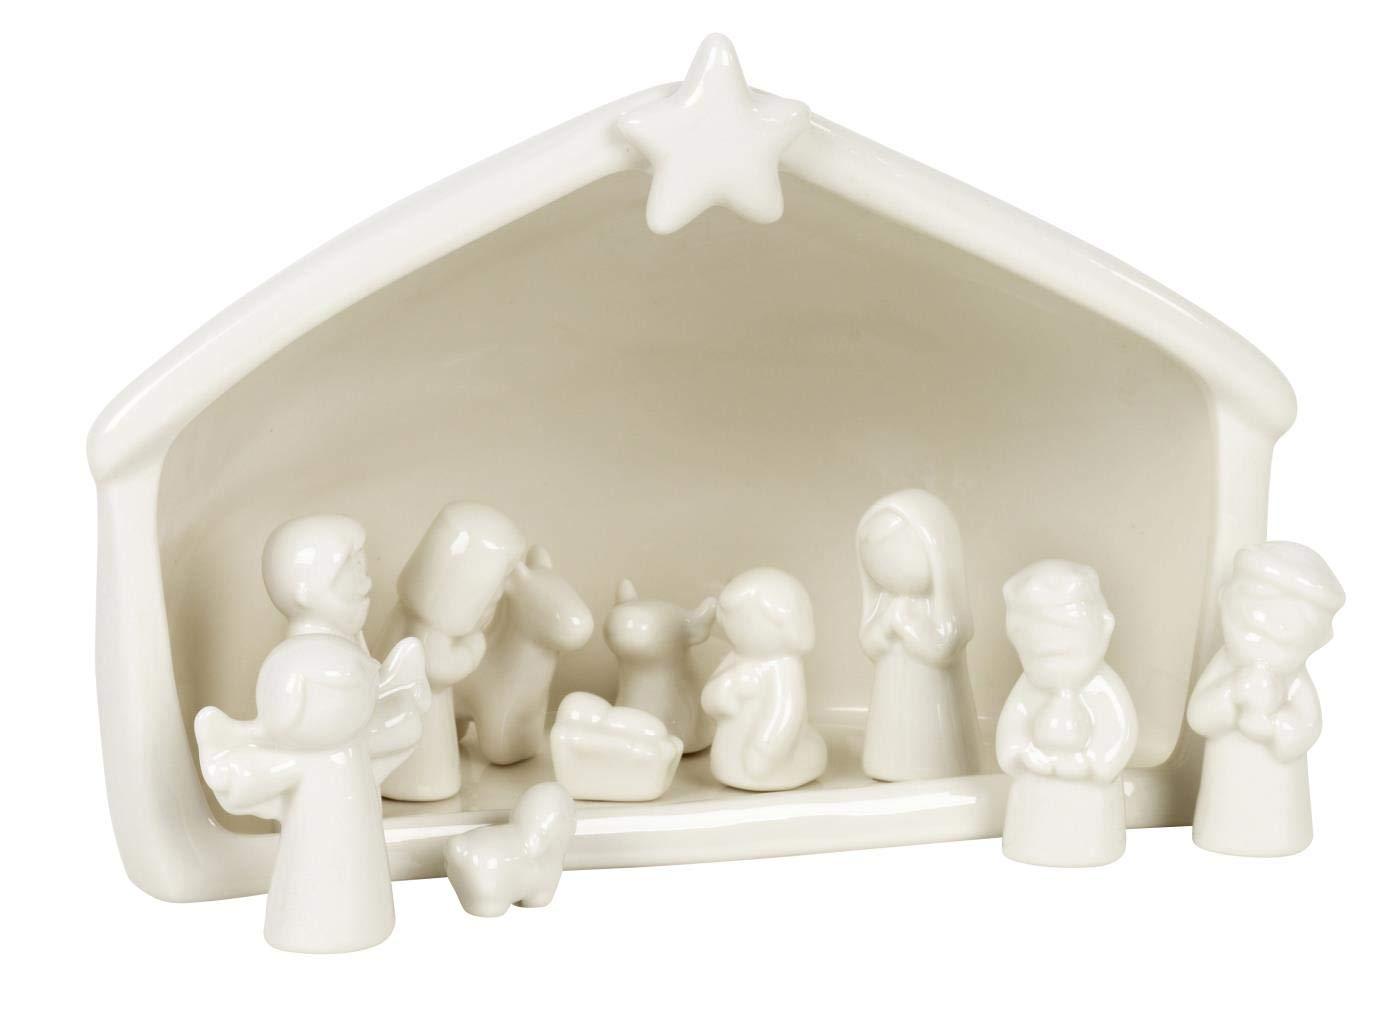 IB Laursen - Weihnachtskrippe mit 11 Figuren - Keramik Keramik Keramik - weiß f9d47a